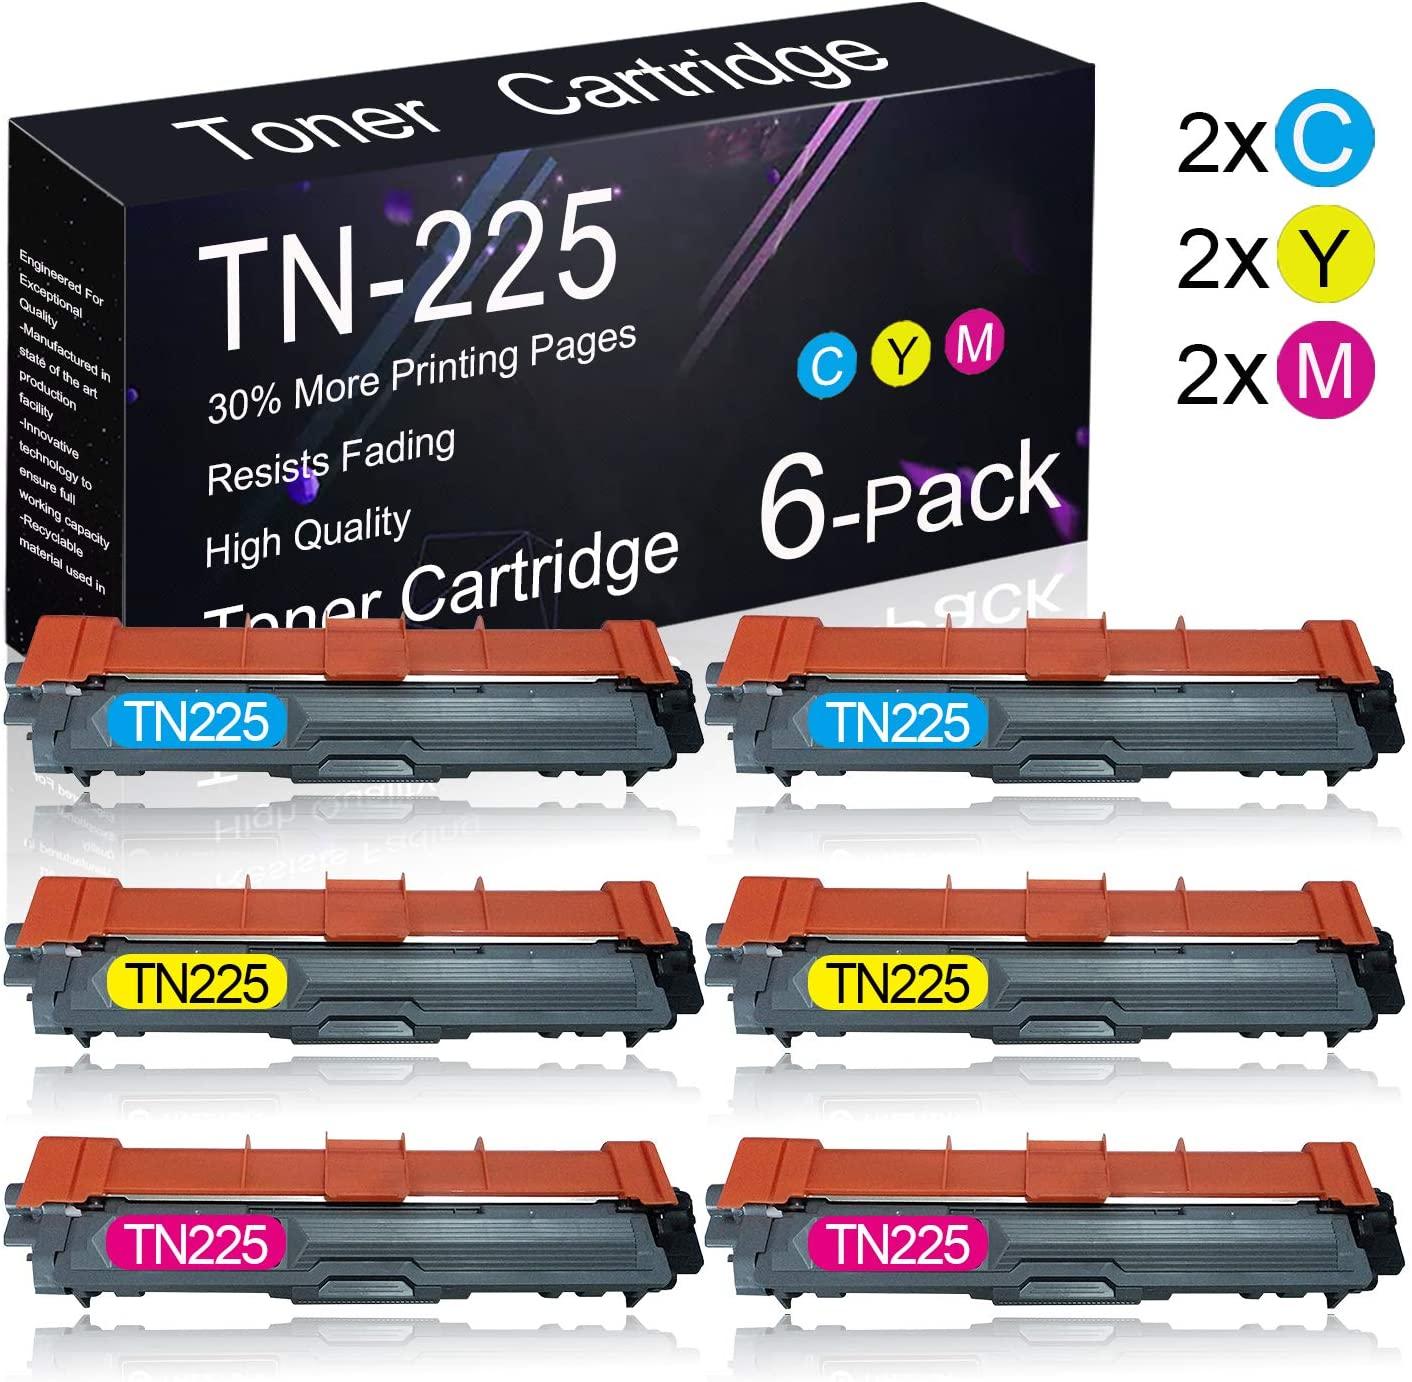 6 Pack TN225 (2C+2Y+2M) Compatible Toner Cartridge Replacement for Brother HL-3140CW/ 3150CDN/ 3170CDW/ 3180CDW, MFC-9130CW/ 9140CDN/ 9330CDW/ 9340CDW, DCP-9015CDW/ 9020CDN Printers.